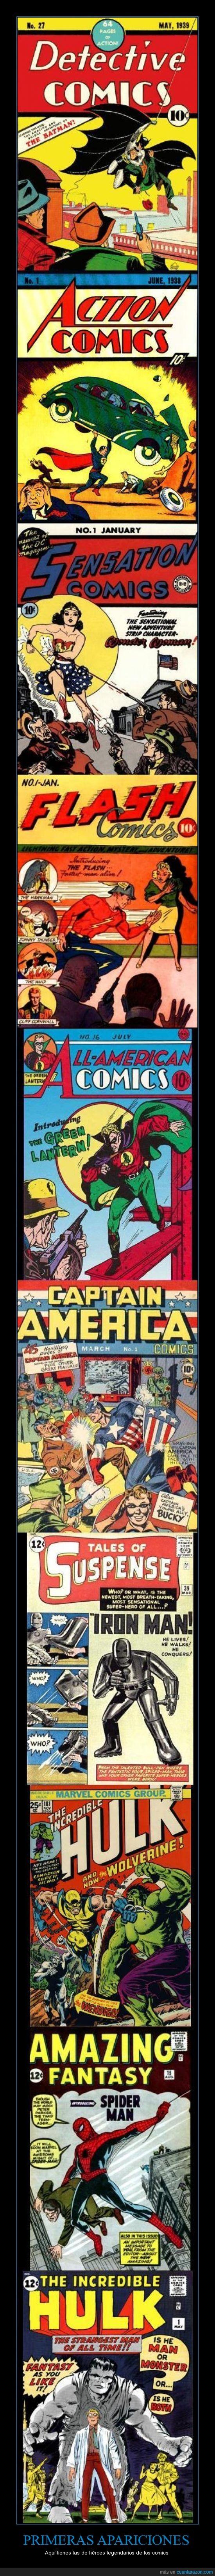 batman,comics,DC,hulk,Marvel,primeras apariciones,spiderman,superman,wonderwoman